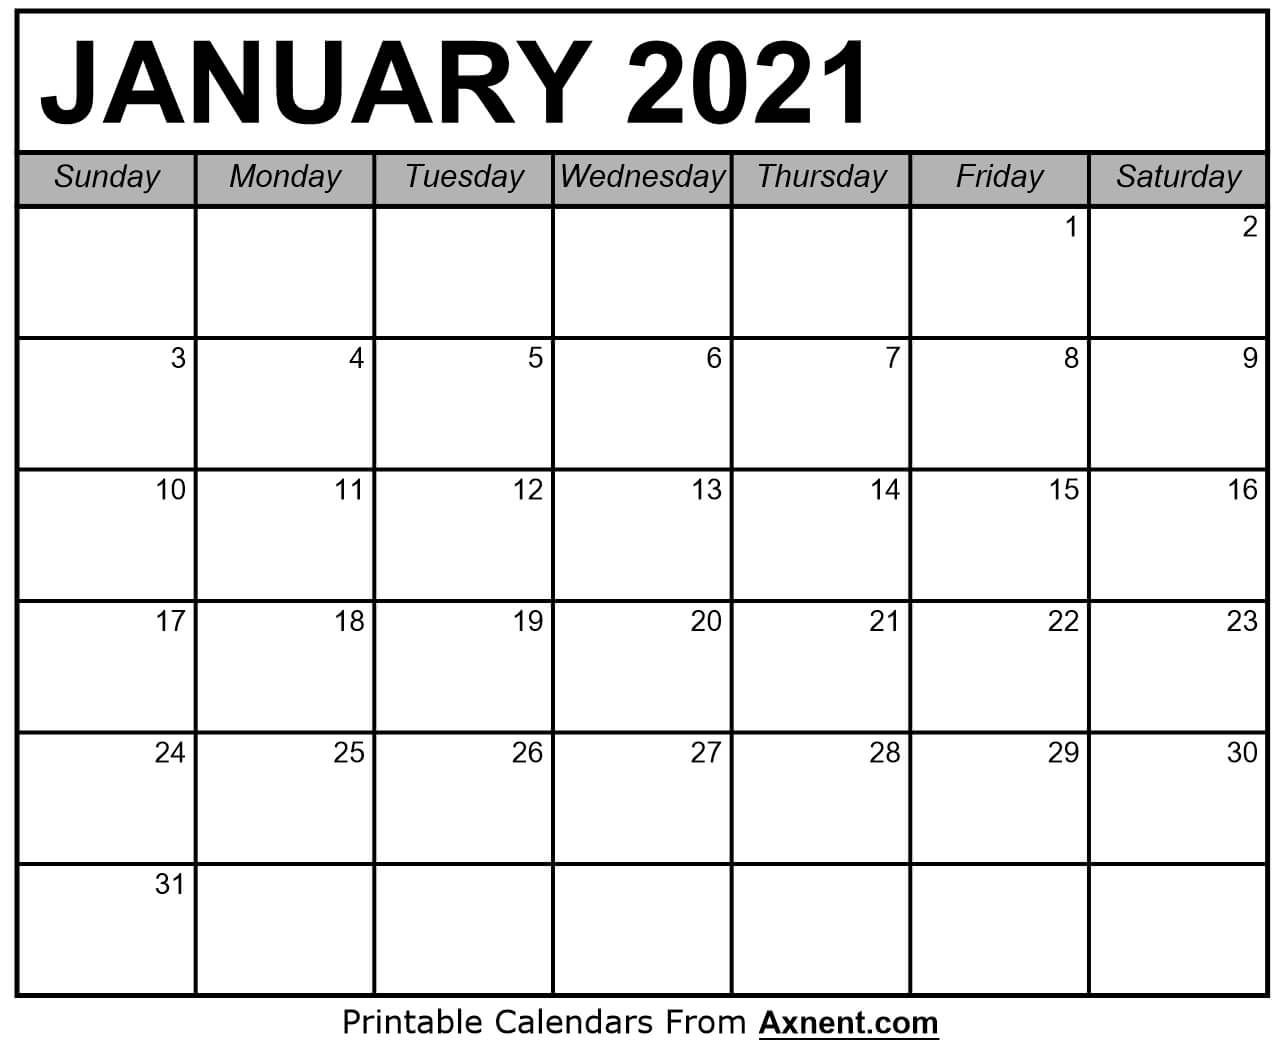 Printable January 2021 Calendar Template - Time Management